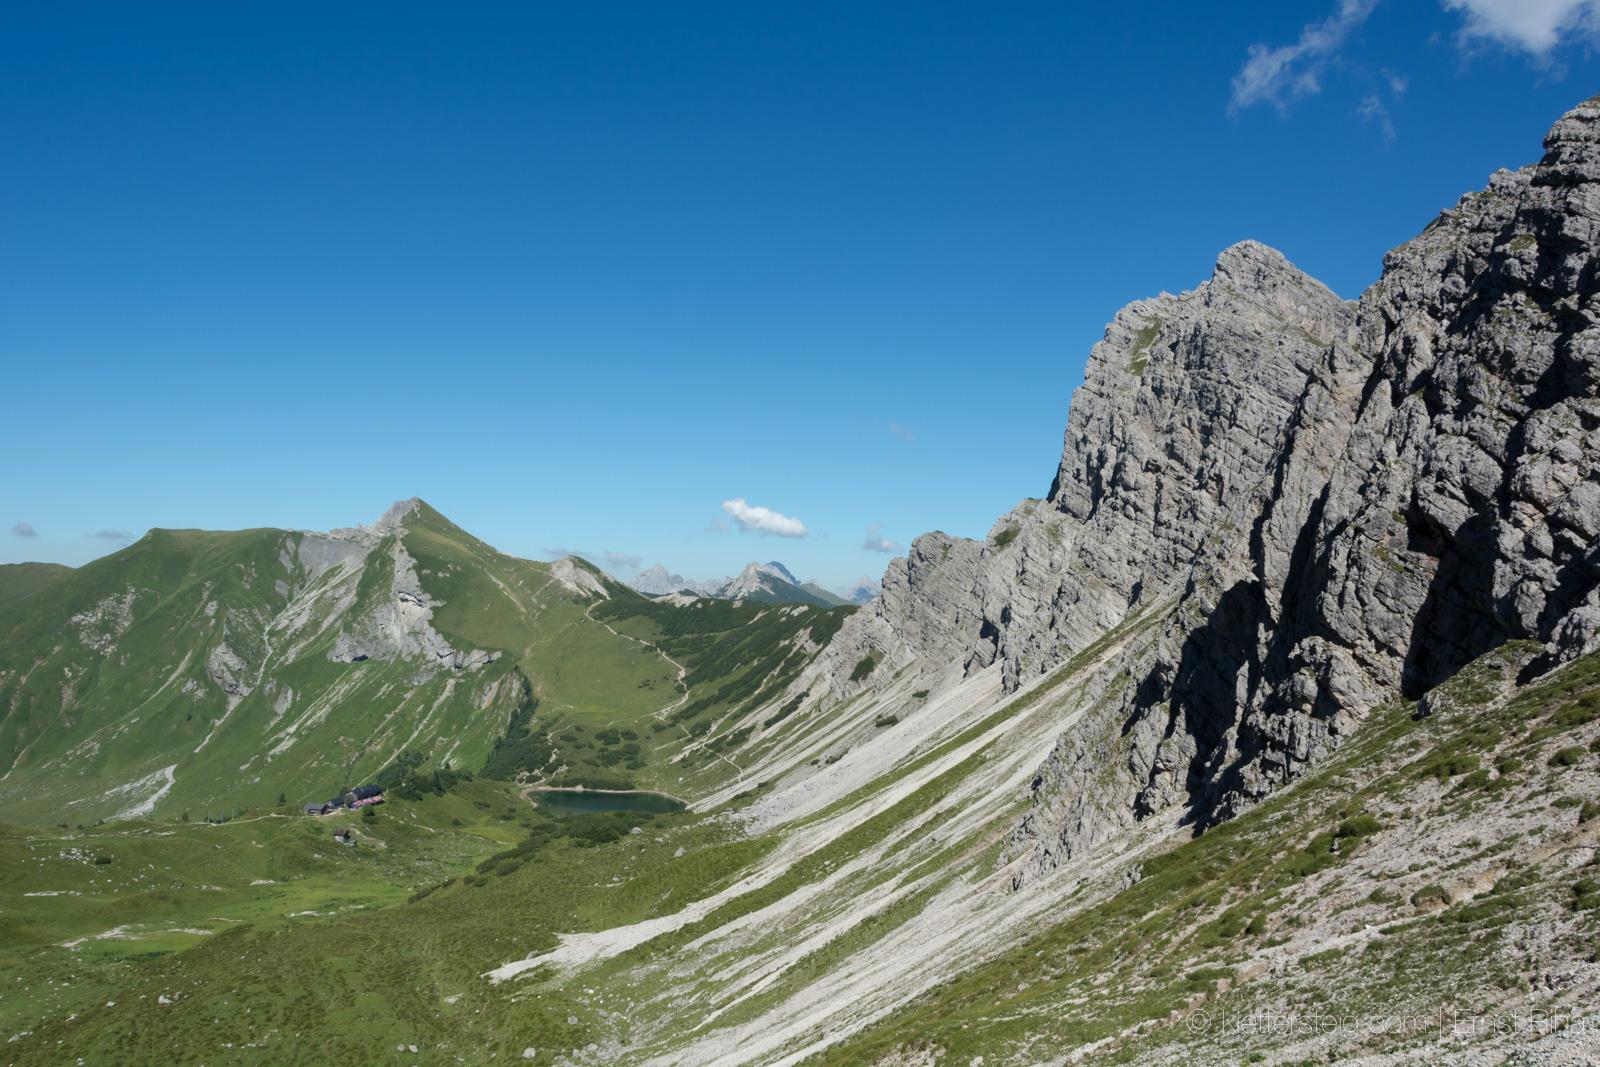 Klettersteig Quarzit Wand Burg Laudeck : News klettersteige